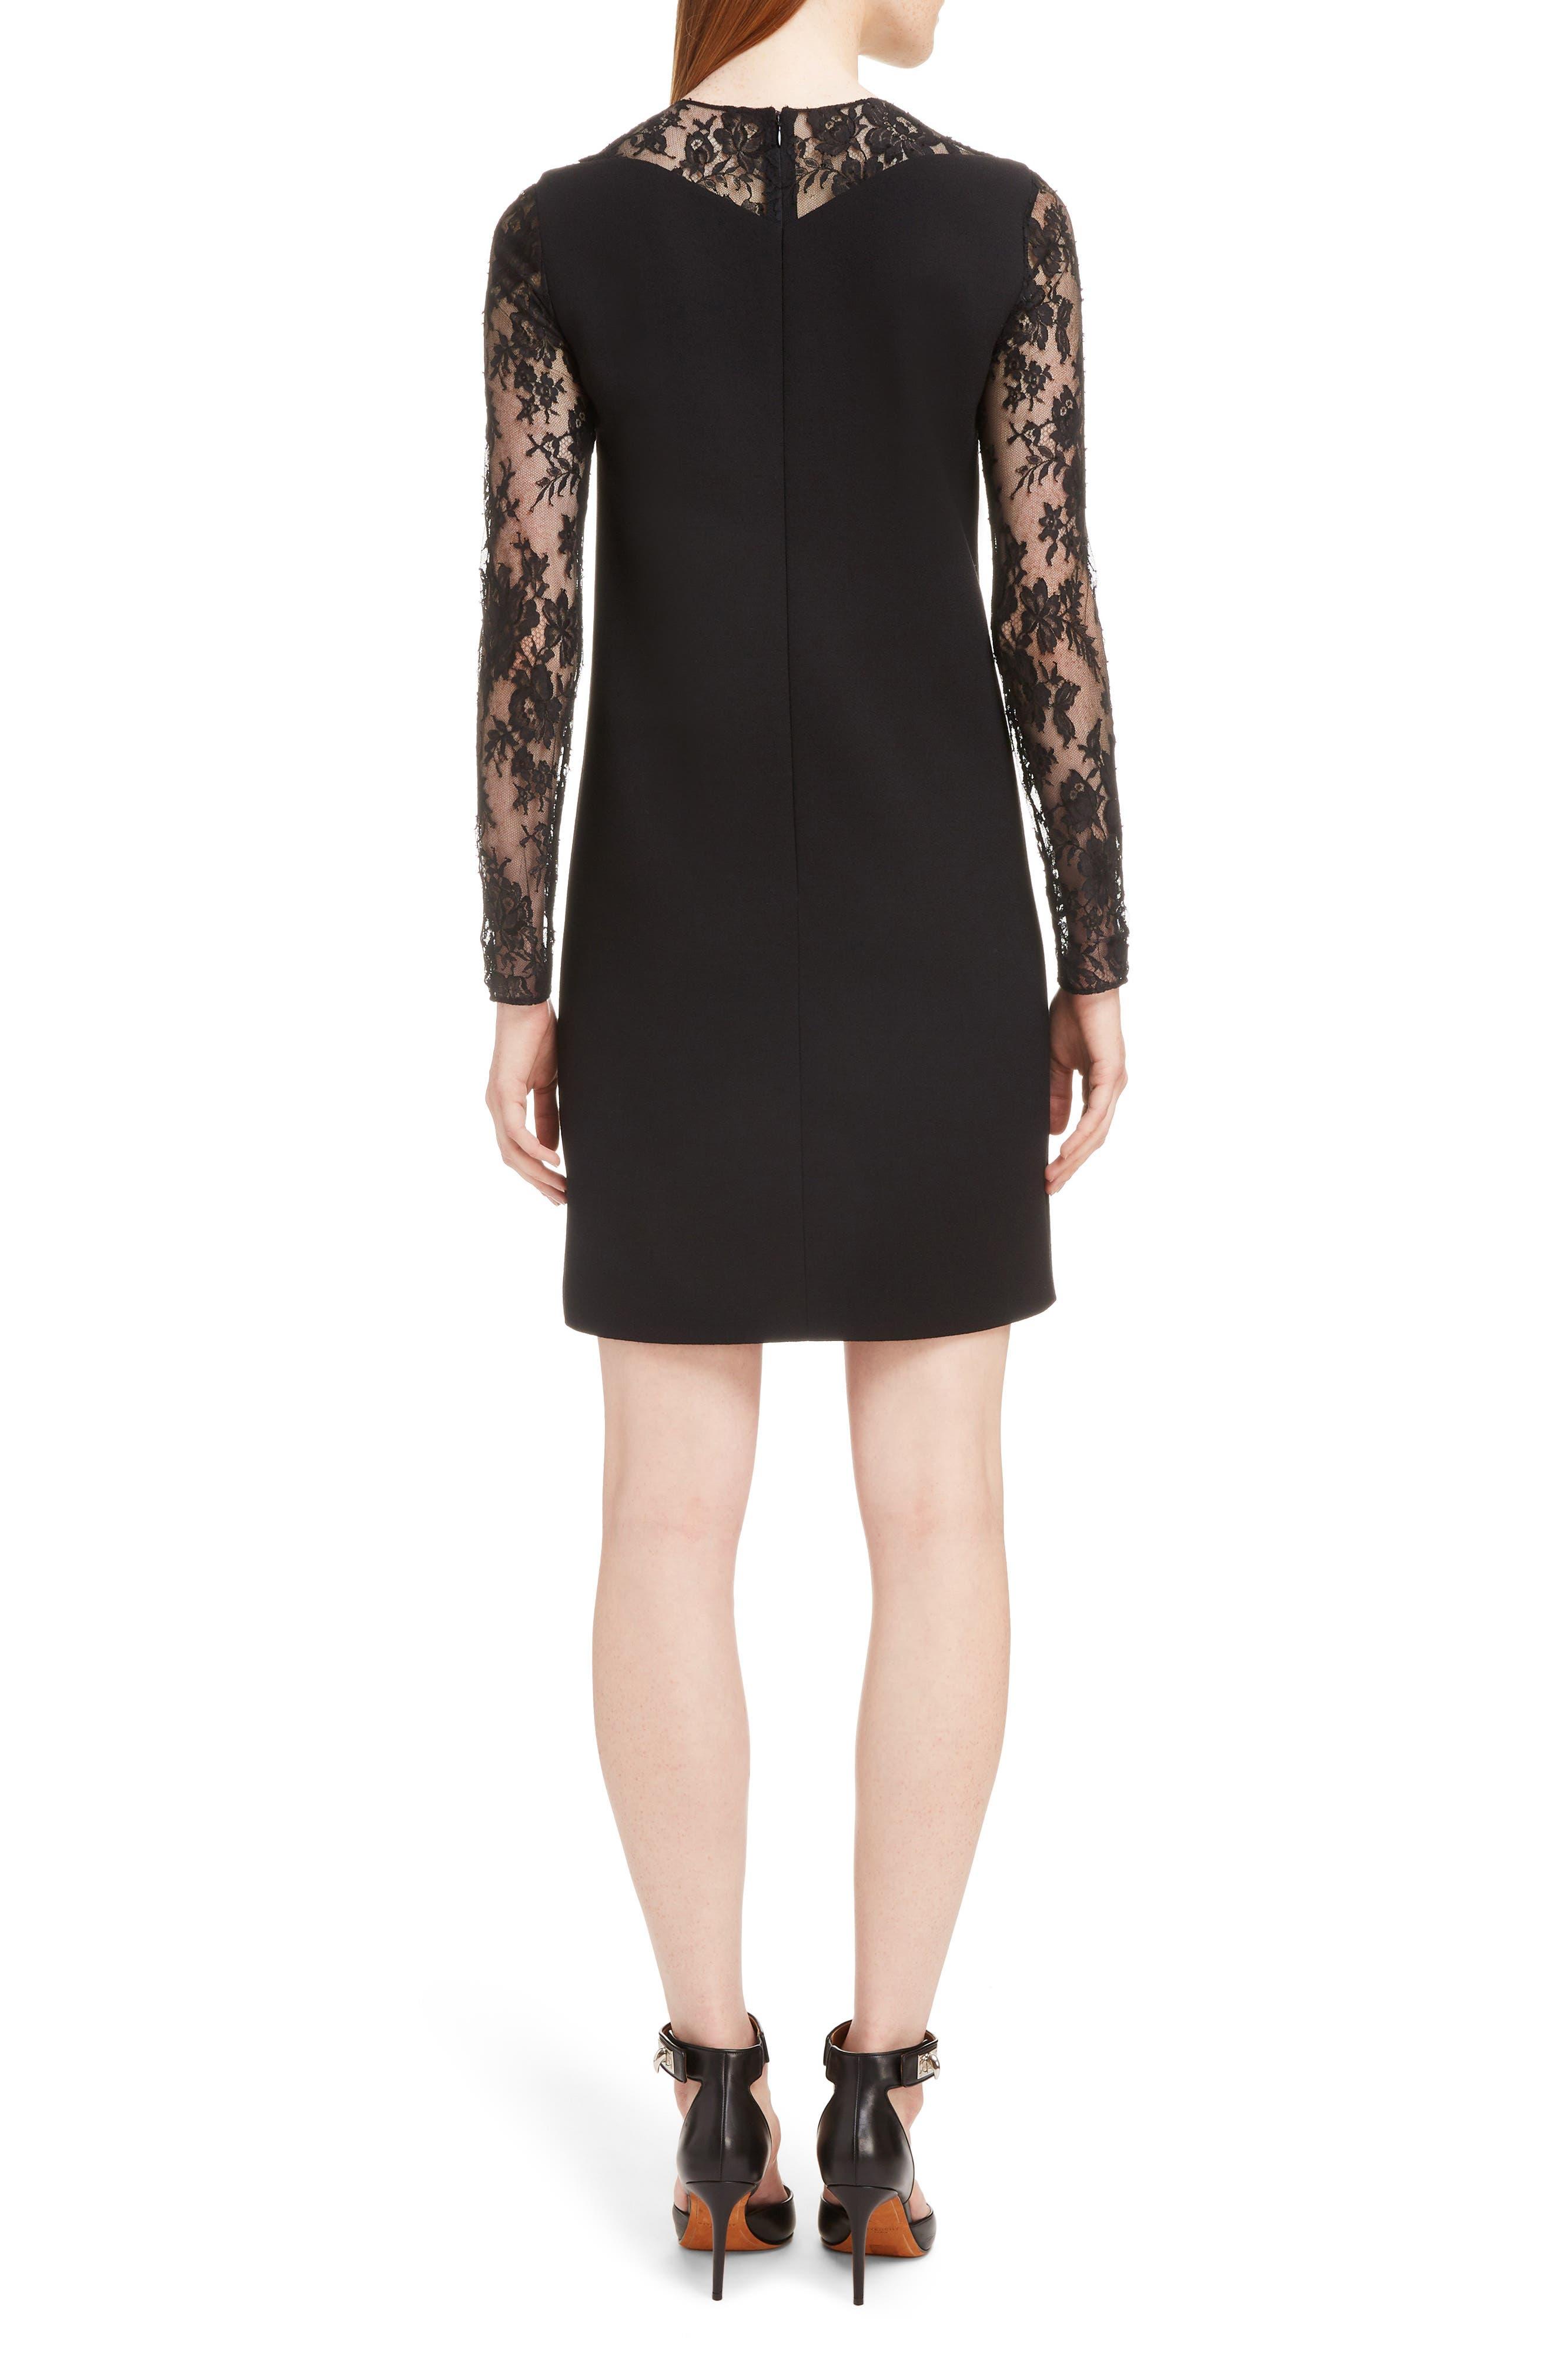 Lace Illusion Dress,                             Alternate thumbnail 2, color,                             001-BLACK